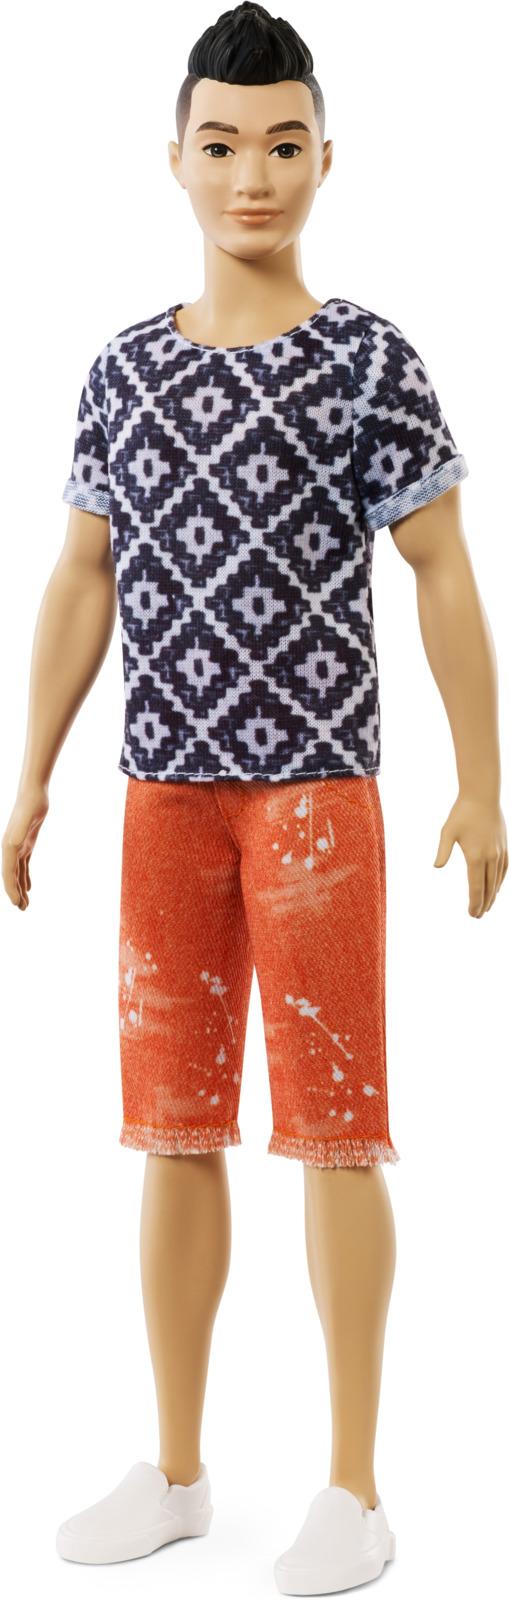 Barbie Кукла Кен Hip Hoodie DWK44_FXL62 цена